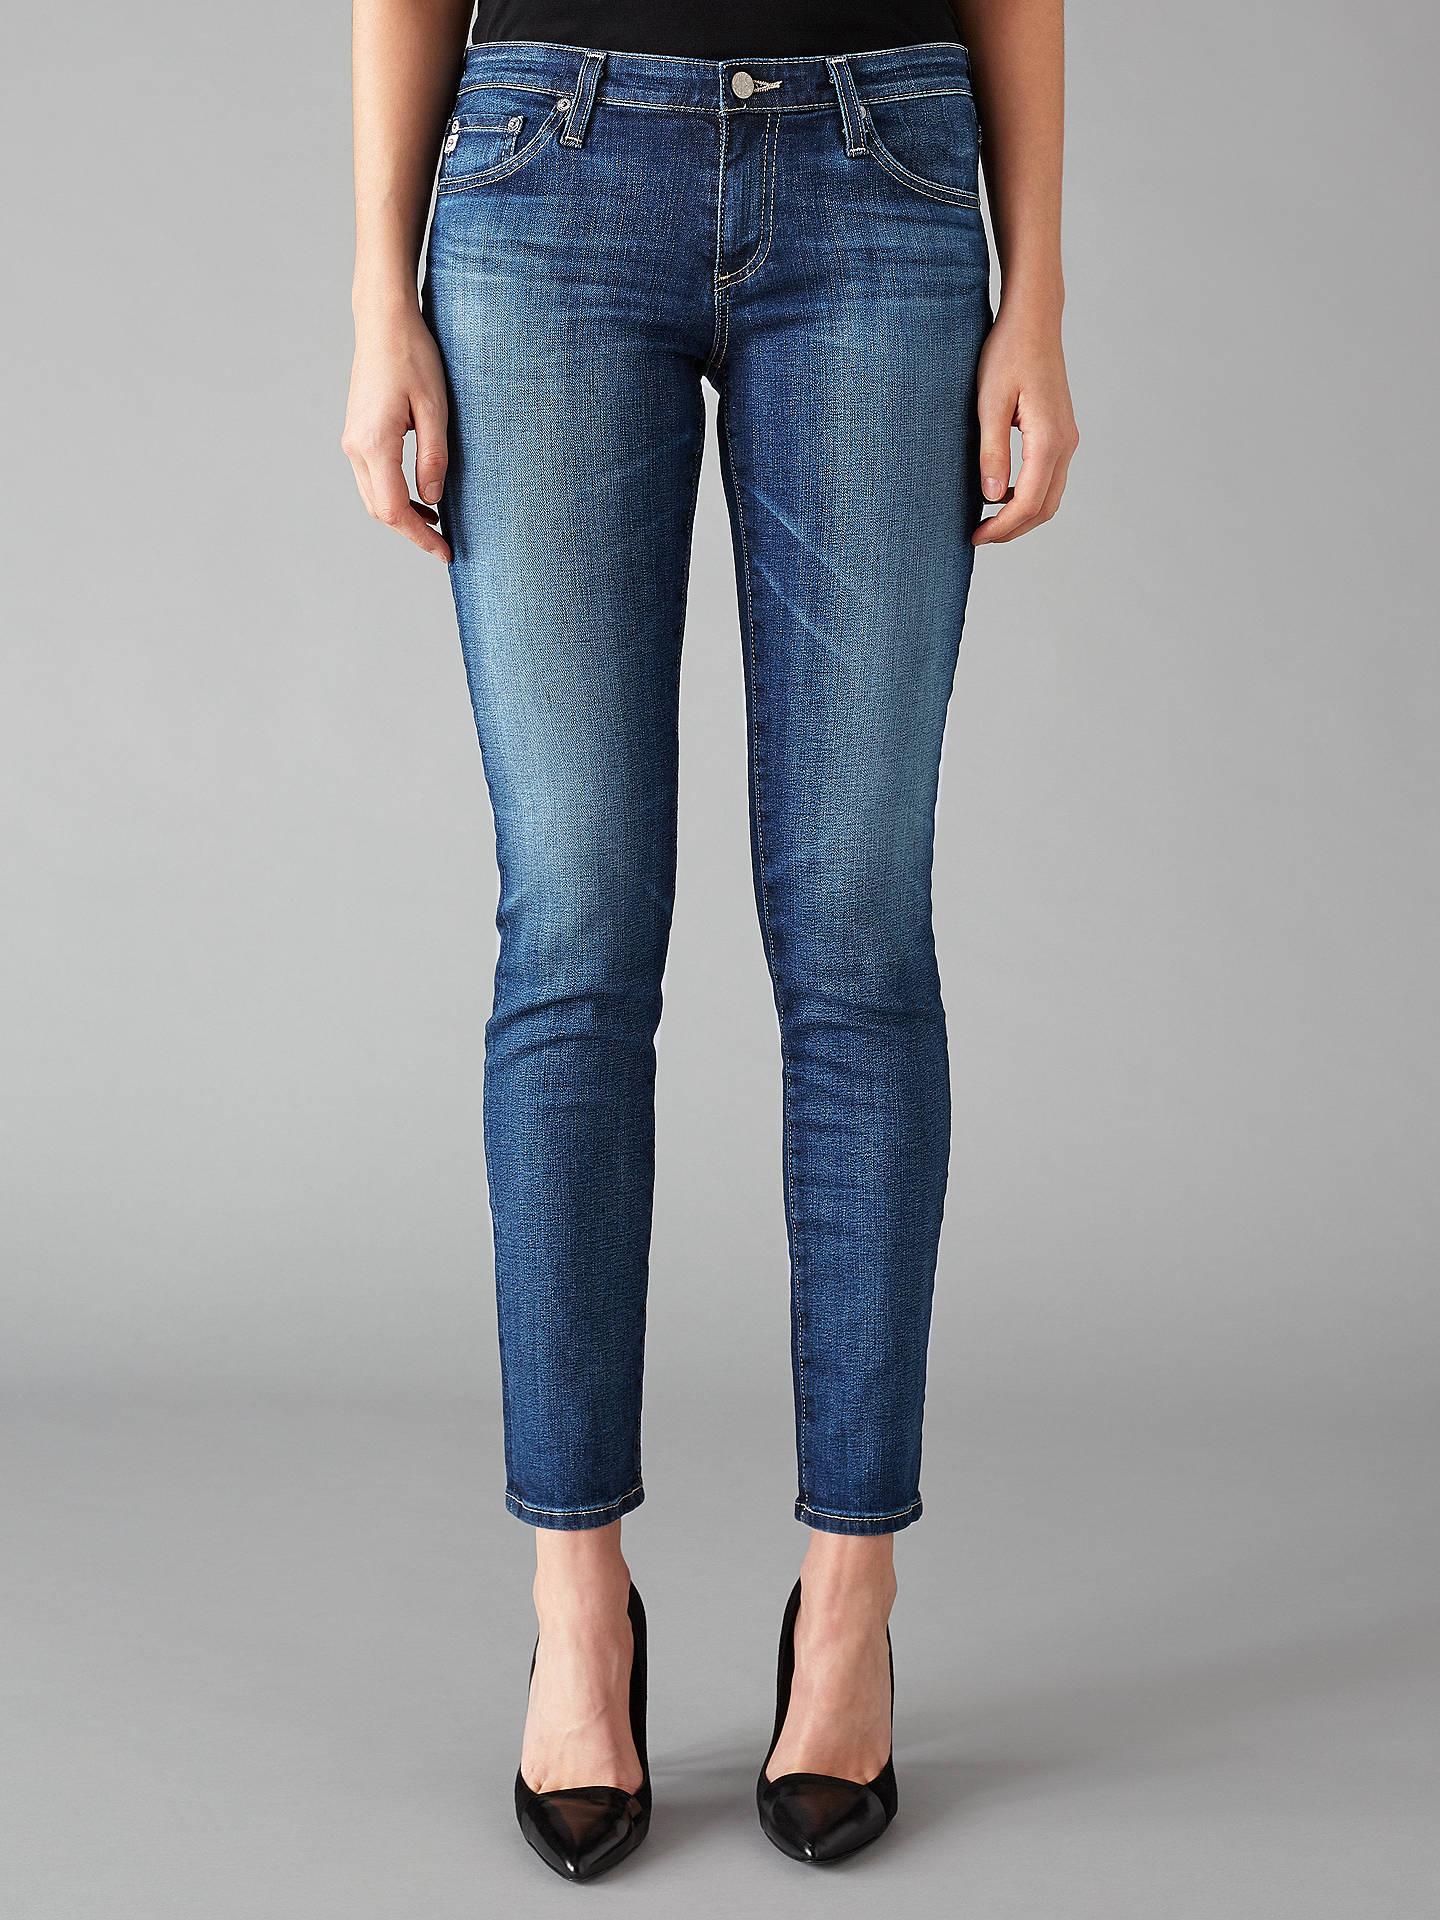 0d04c961981084 Buy AG The Stilt Mid Rise Skinny Jeans, 11 Years Journey, 24 Online at ...